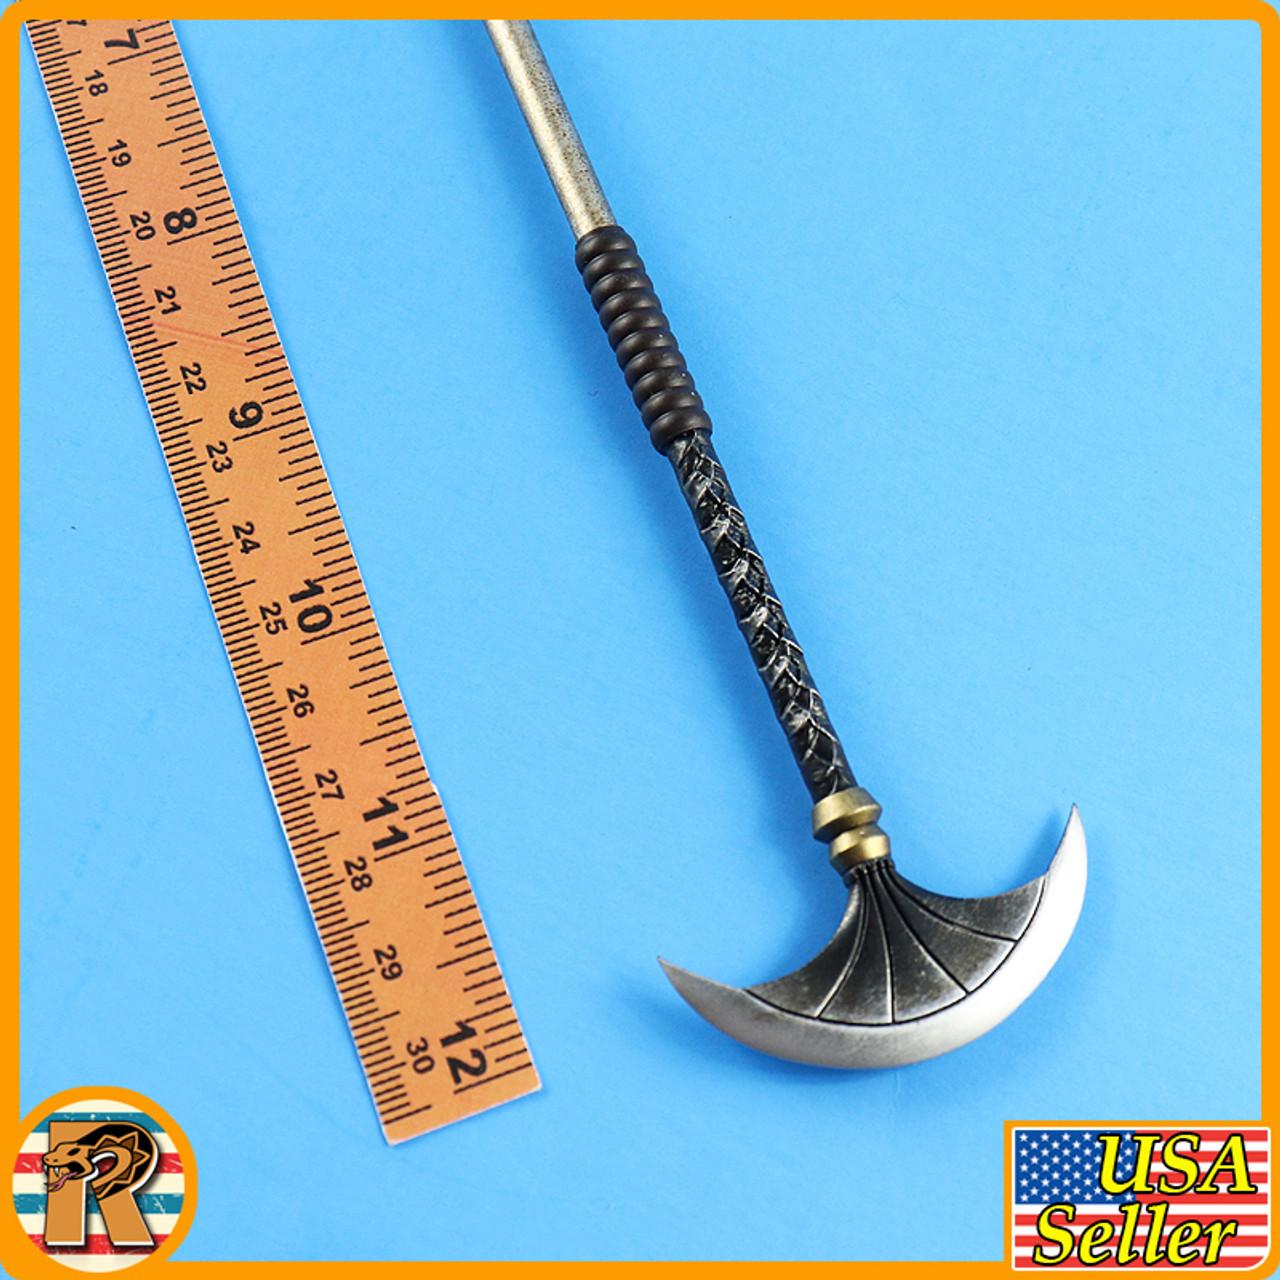 Month Deity of War (SILVER) - Long Scepter - 1/6 Scale -